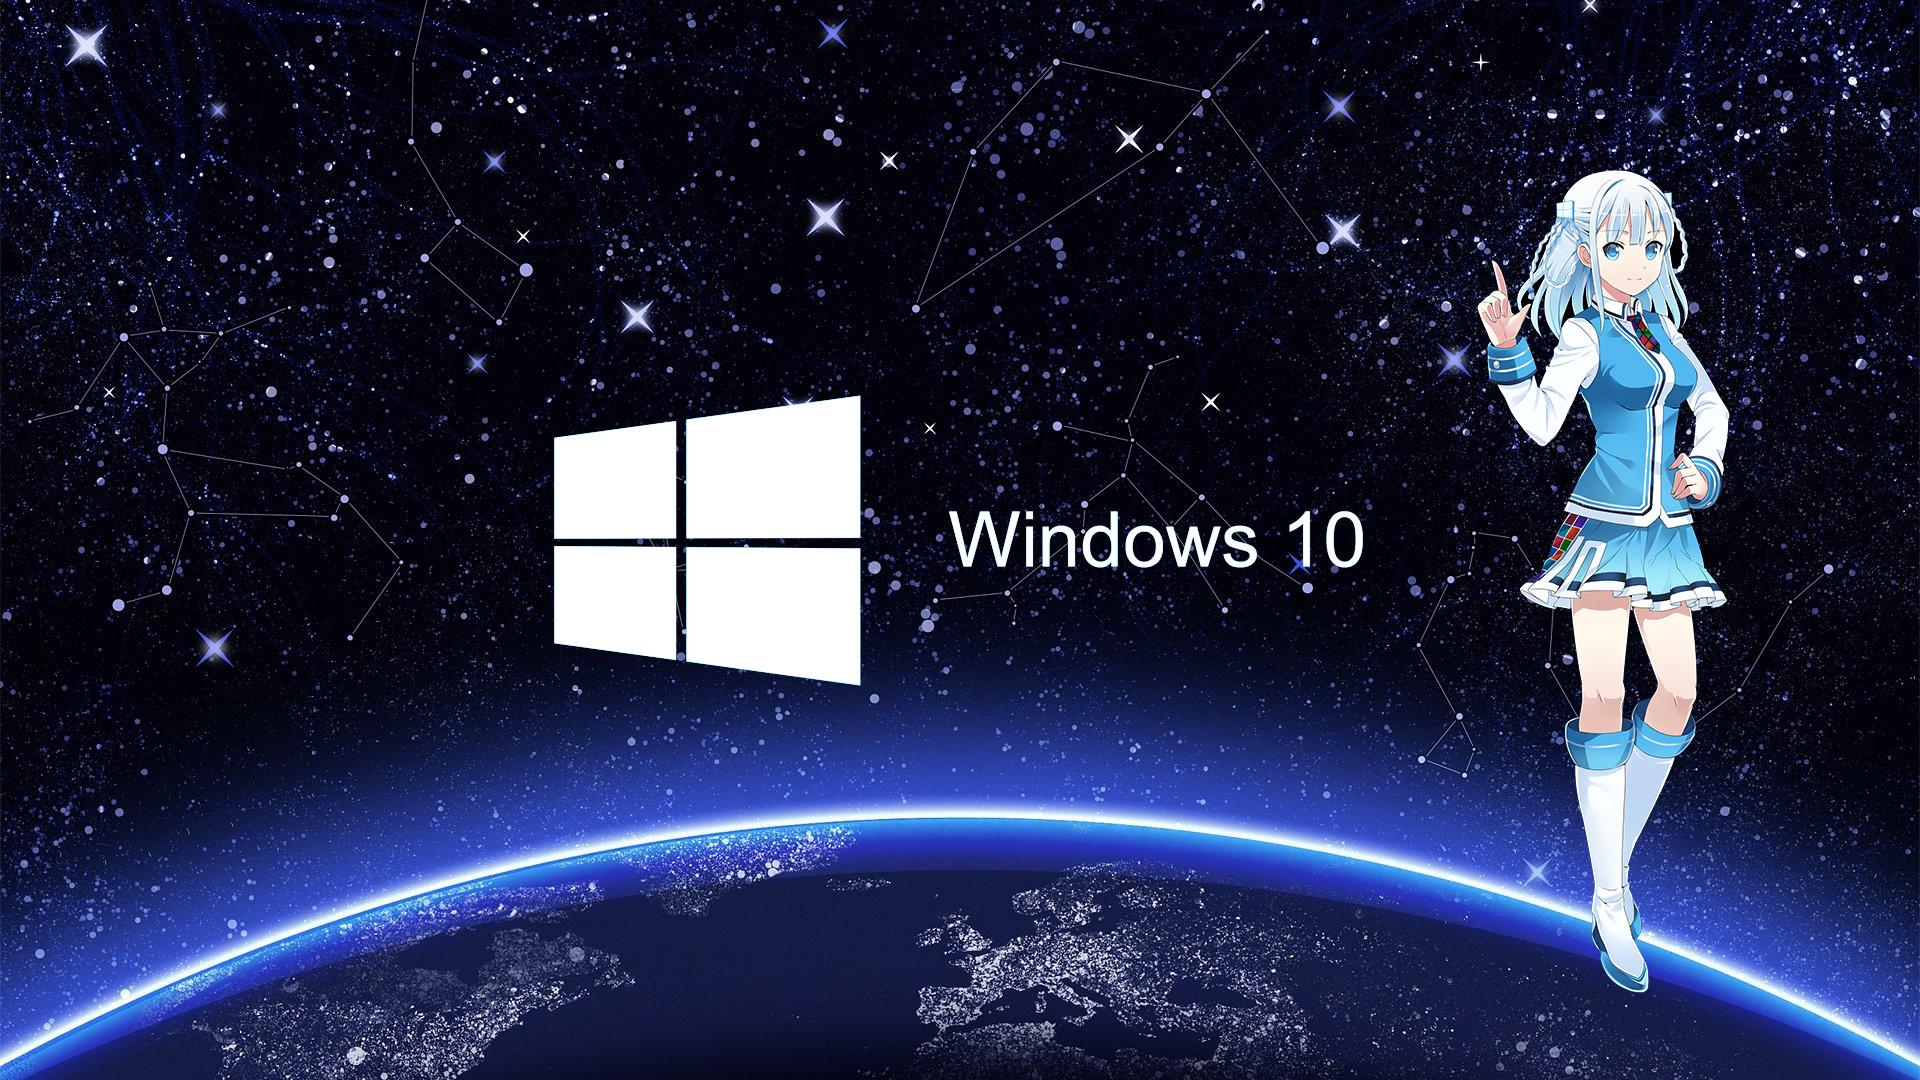 Windows space wallpaper hd